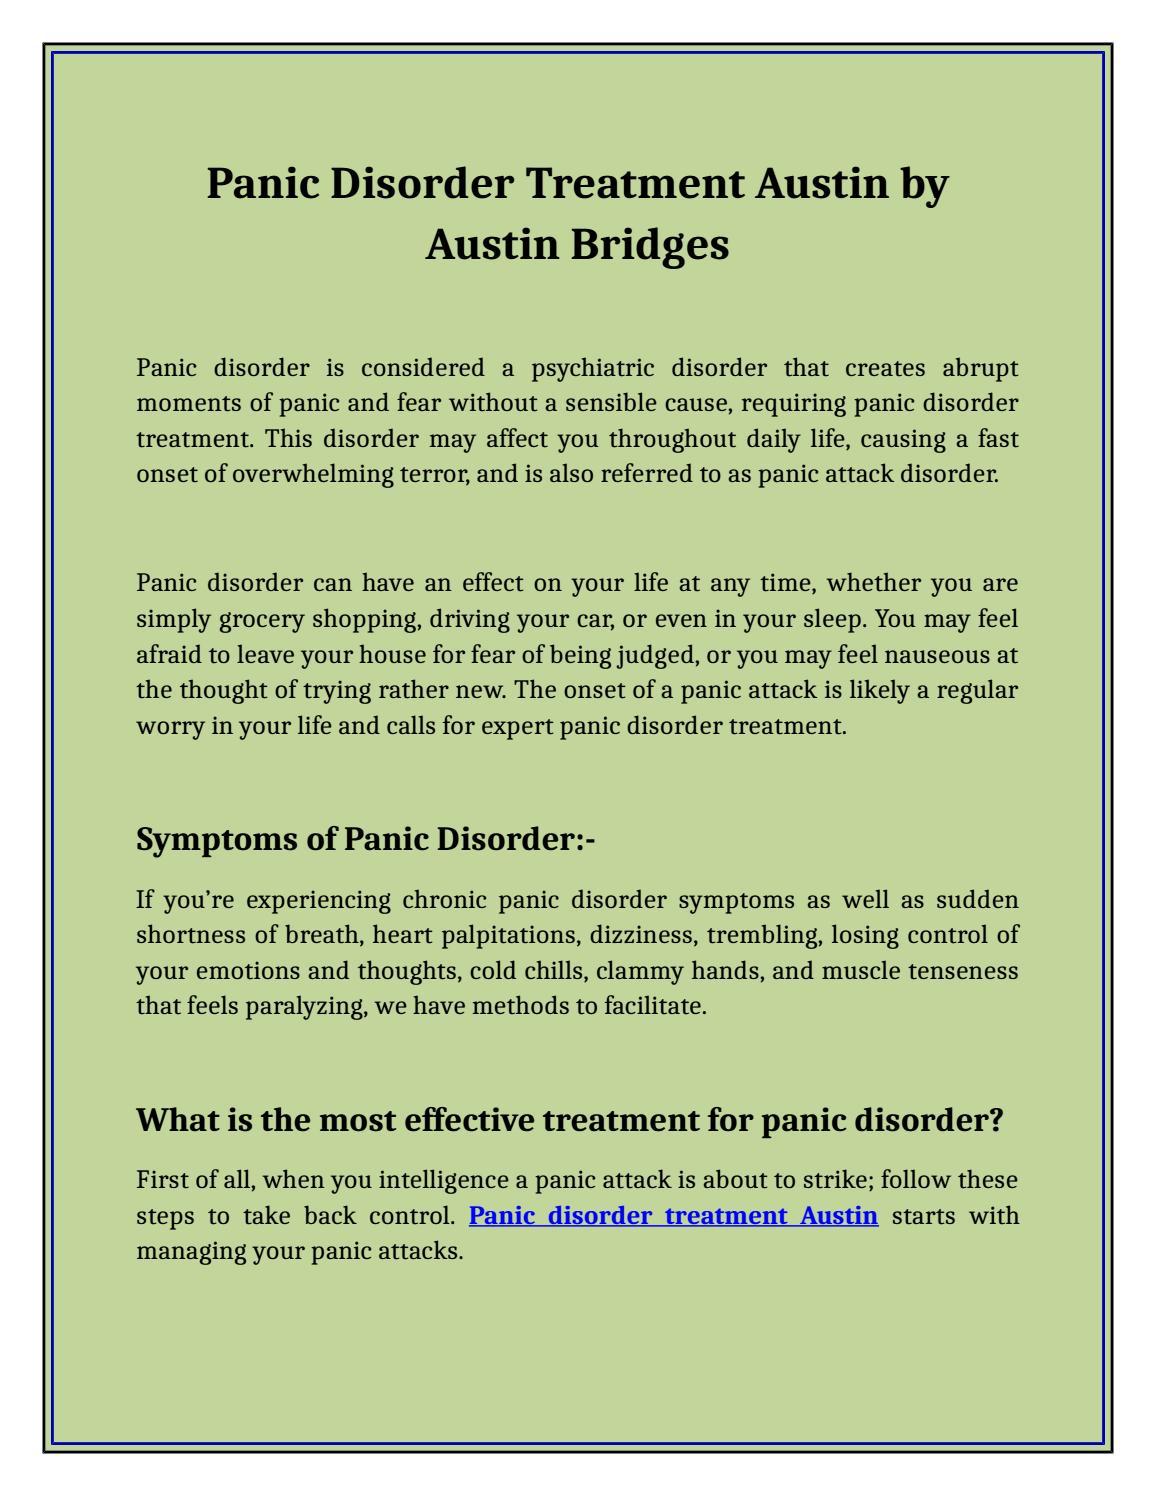 Panic Disorder Treatment Austin by Austin Bridges by Austin